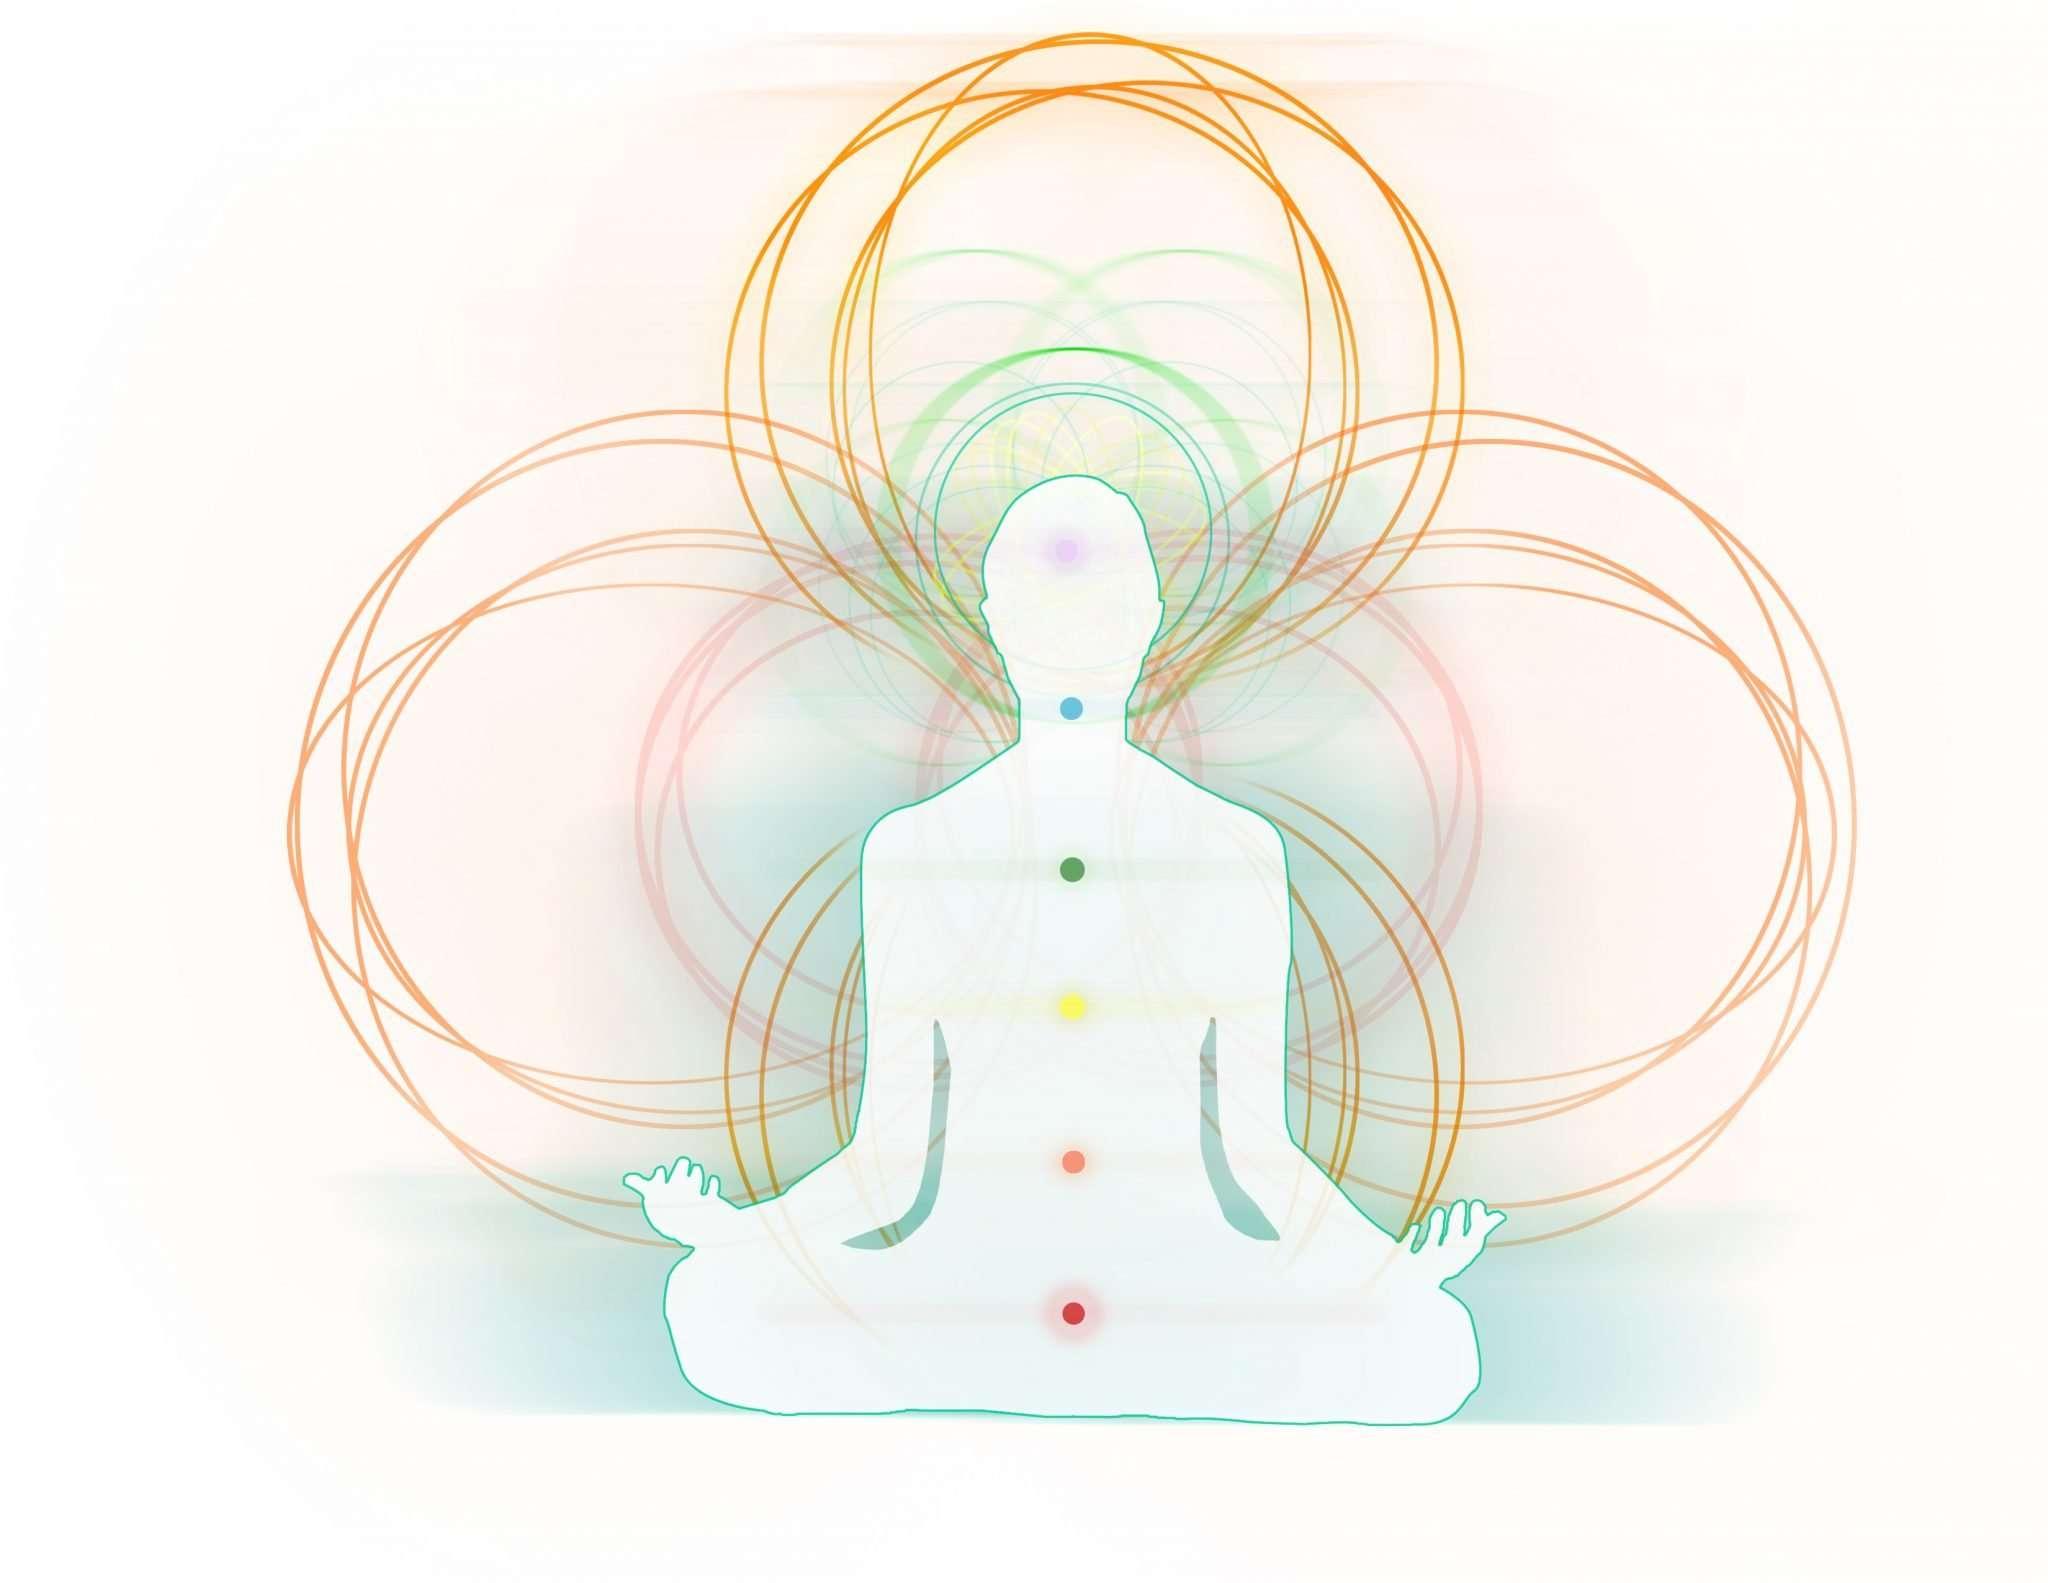 Chakras are Spiritual